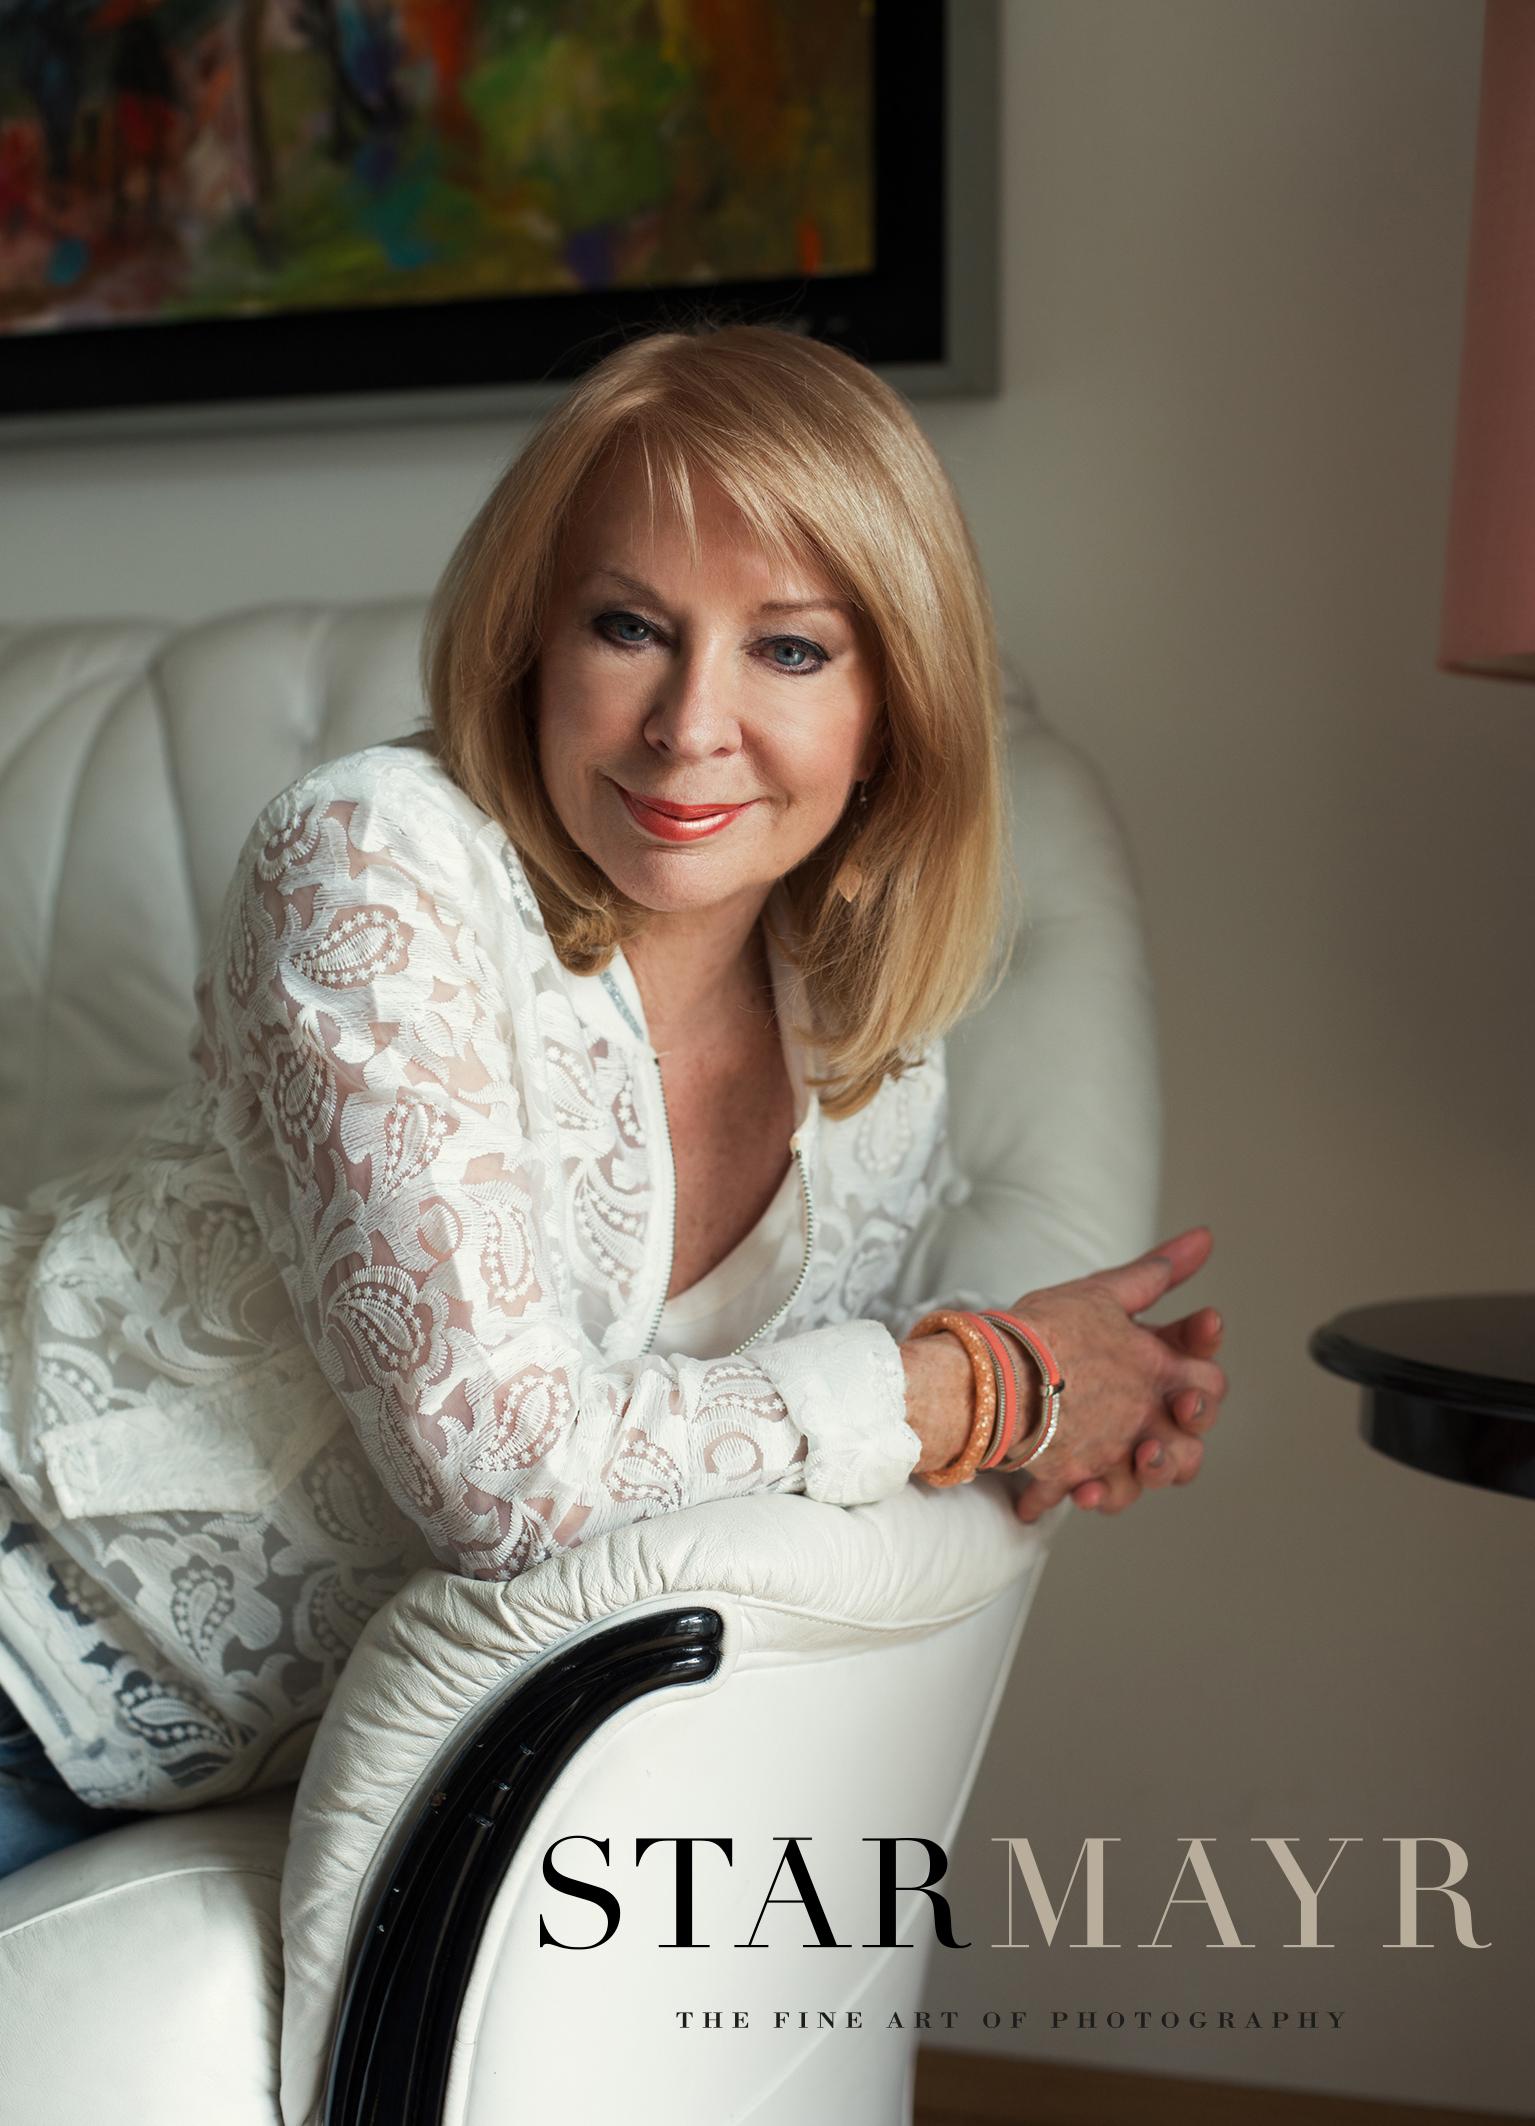 Sabine Starmayr, Fotografin, Gerda Rogers, Astrologin 5